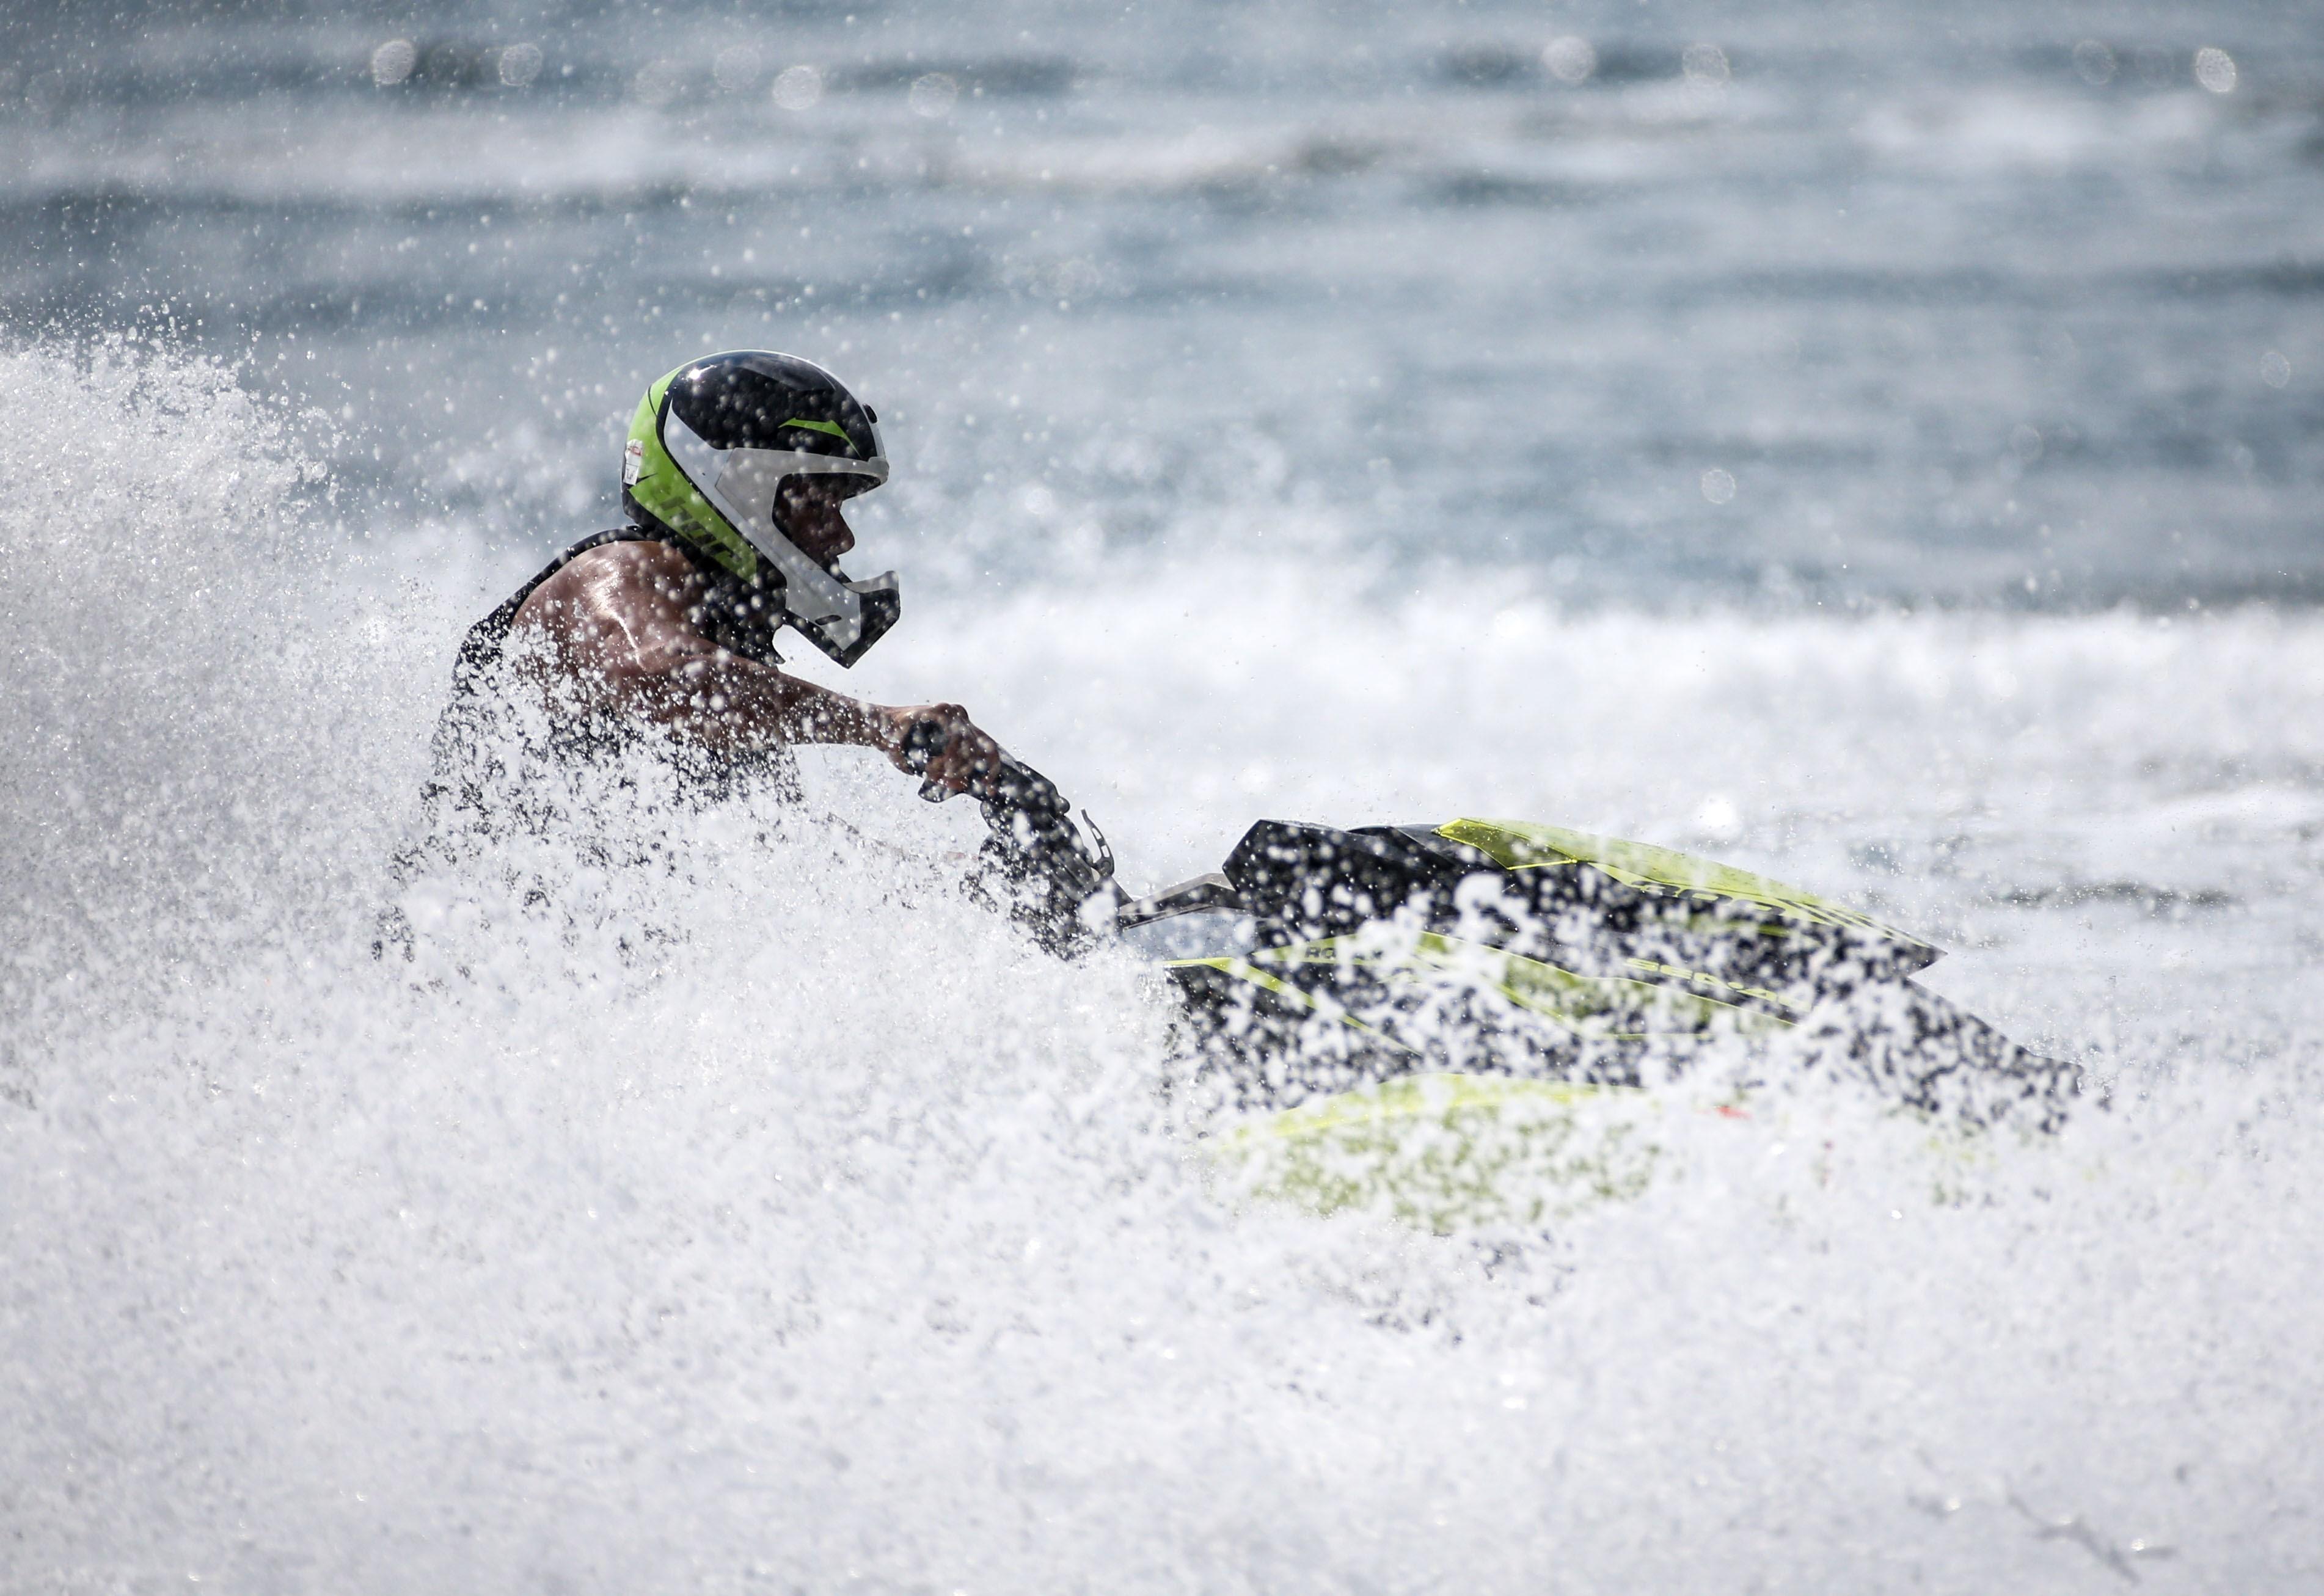 International Istanbul Water Sports Festival